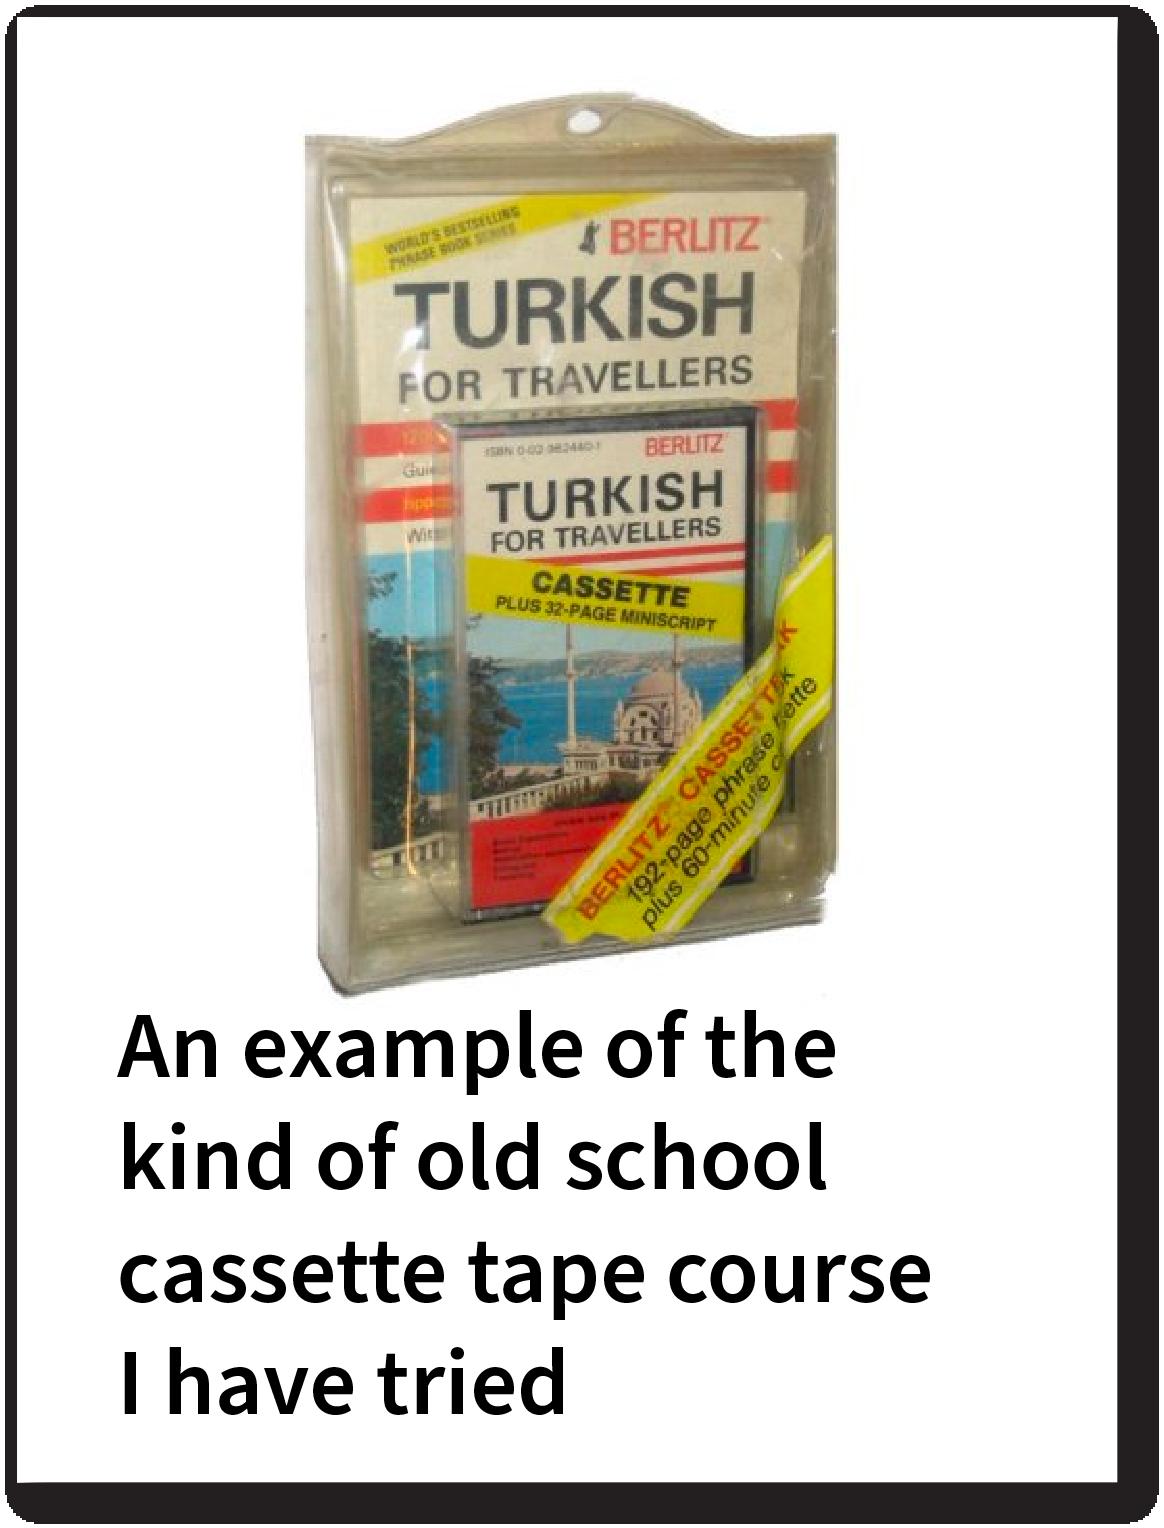 Old school cassette tape course